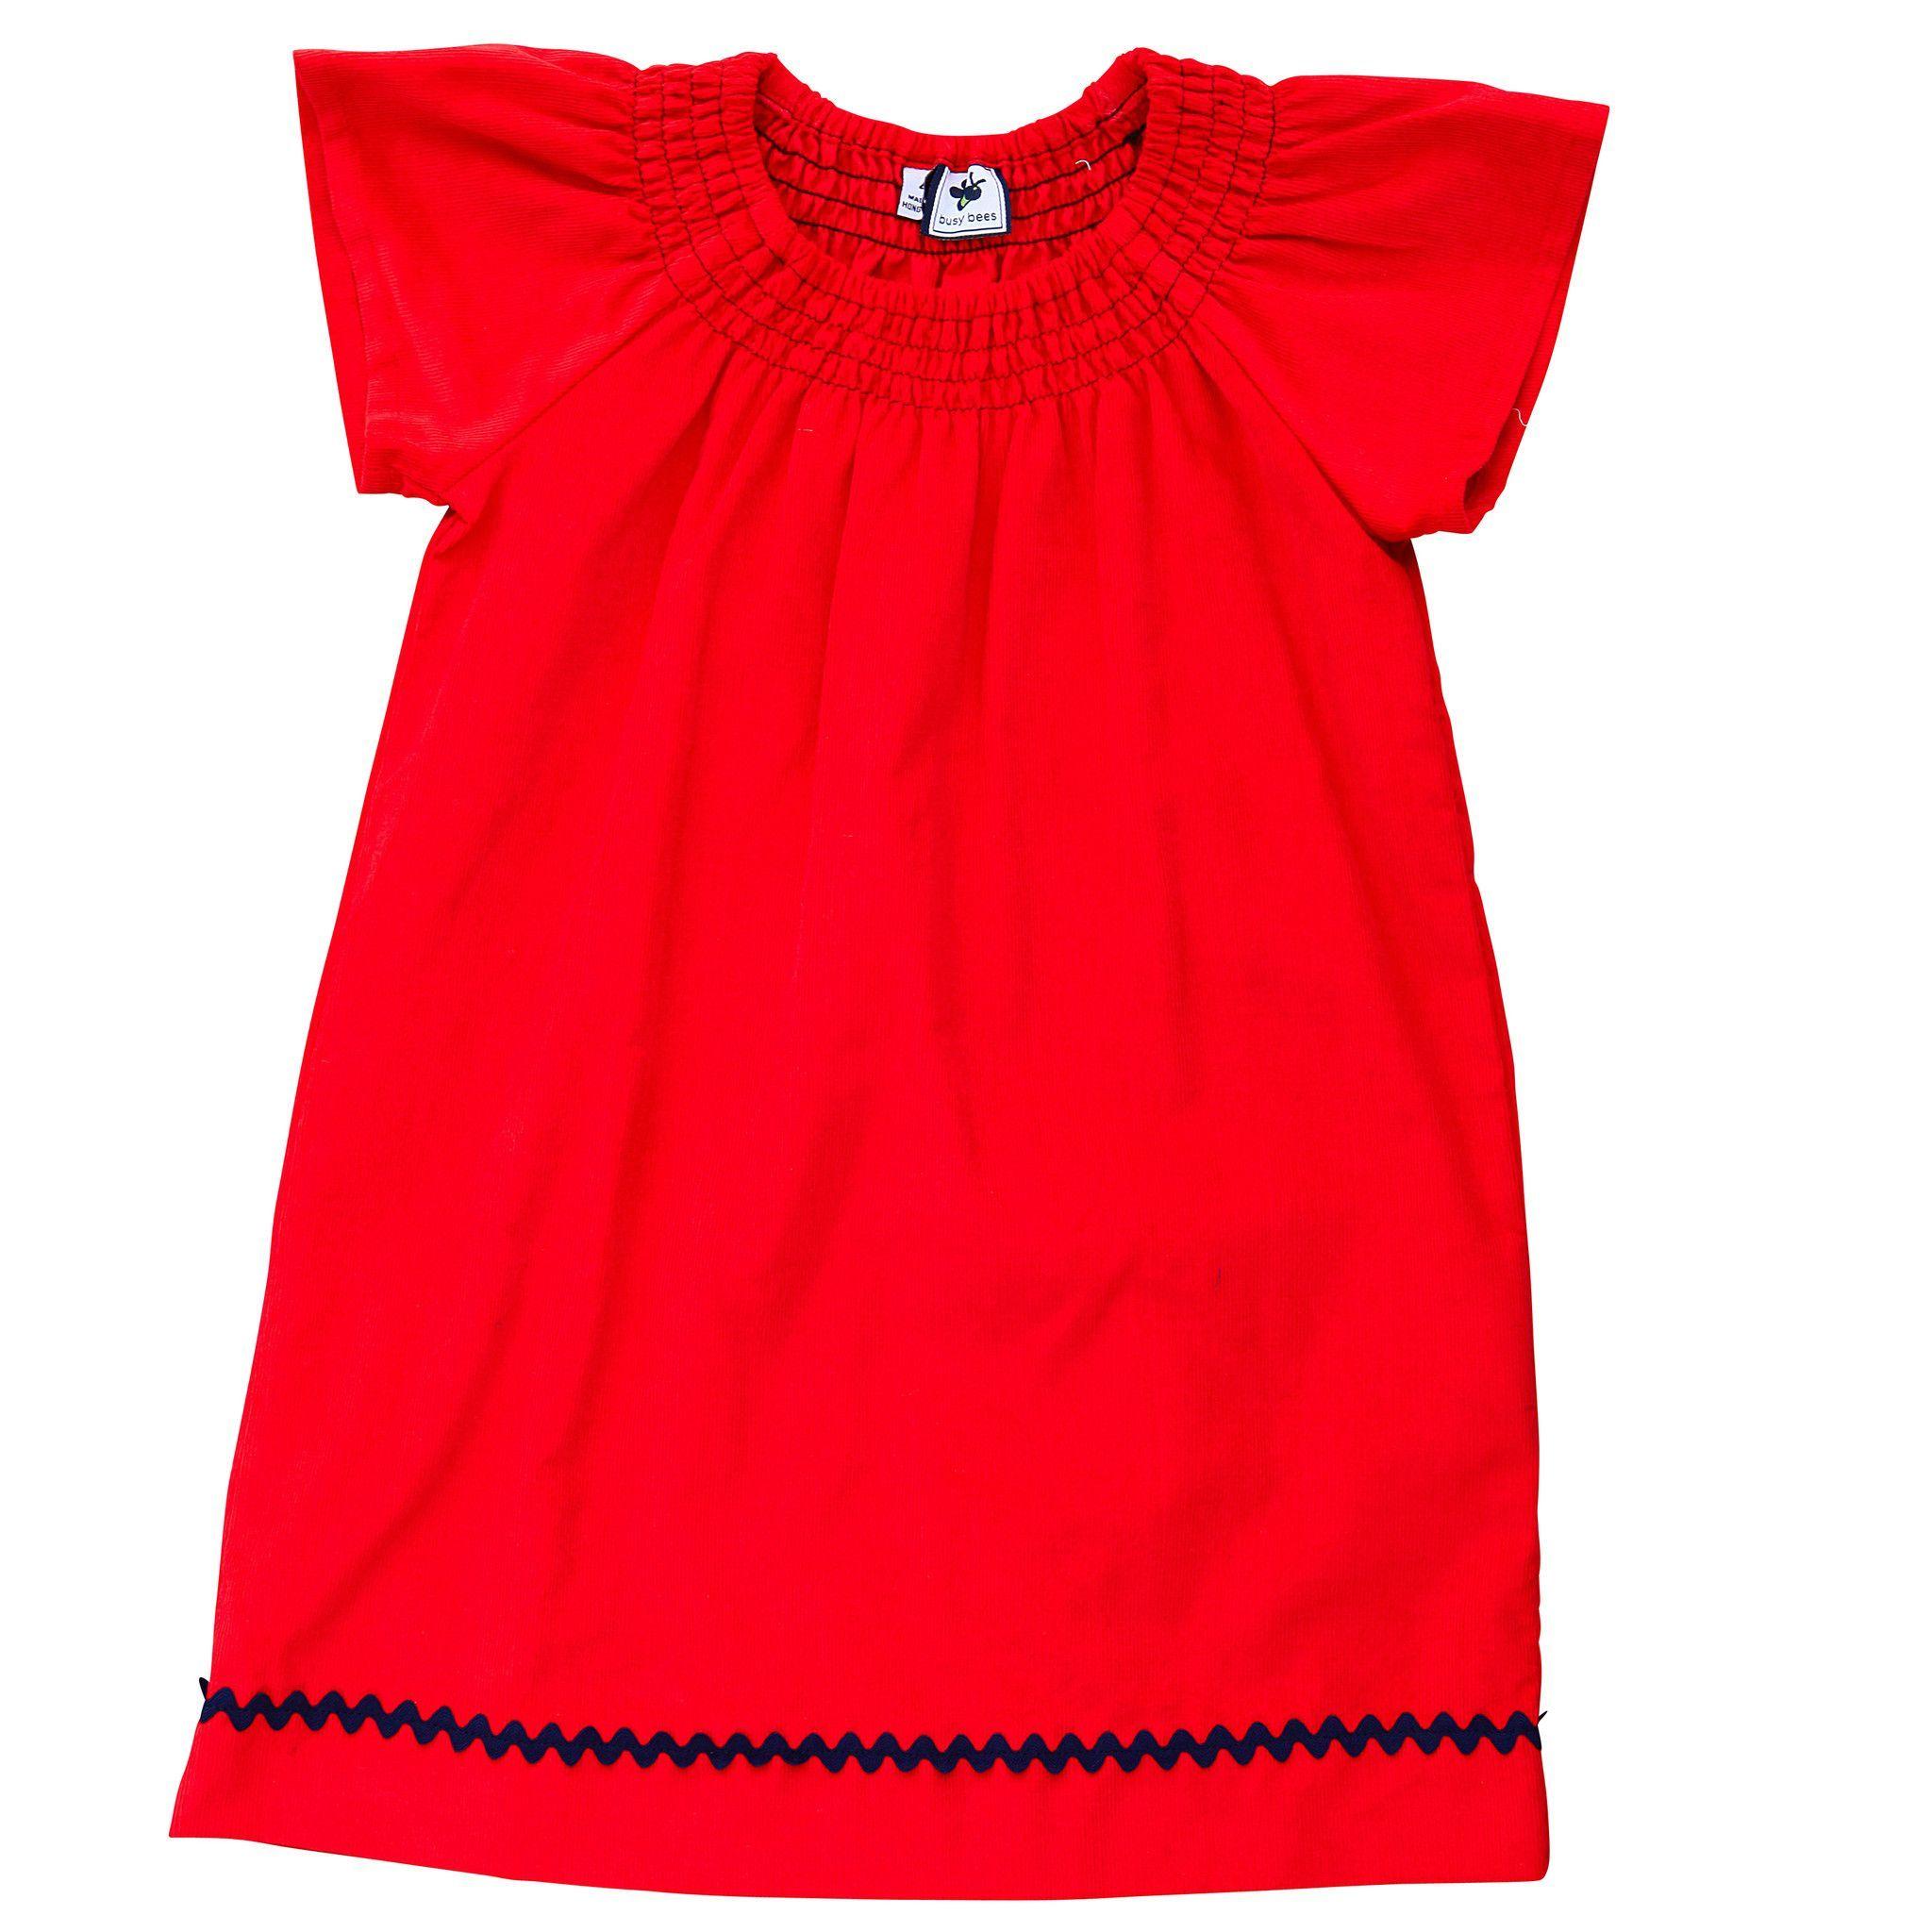 hadley flutter sleeve dress red corduroy